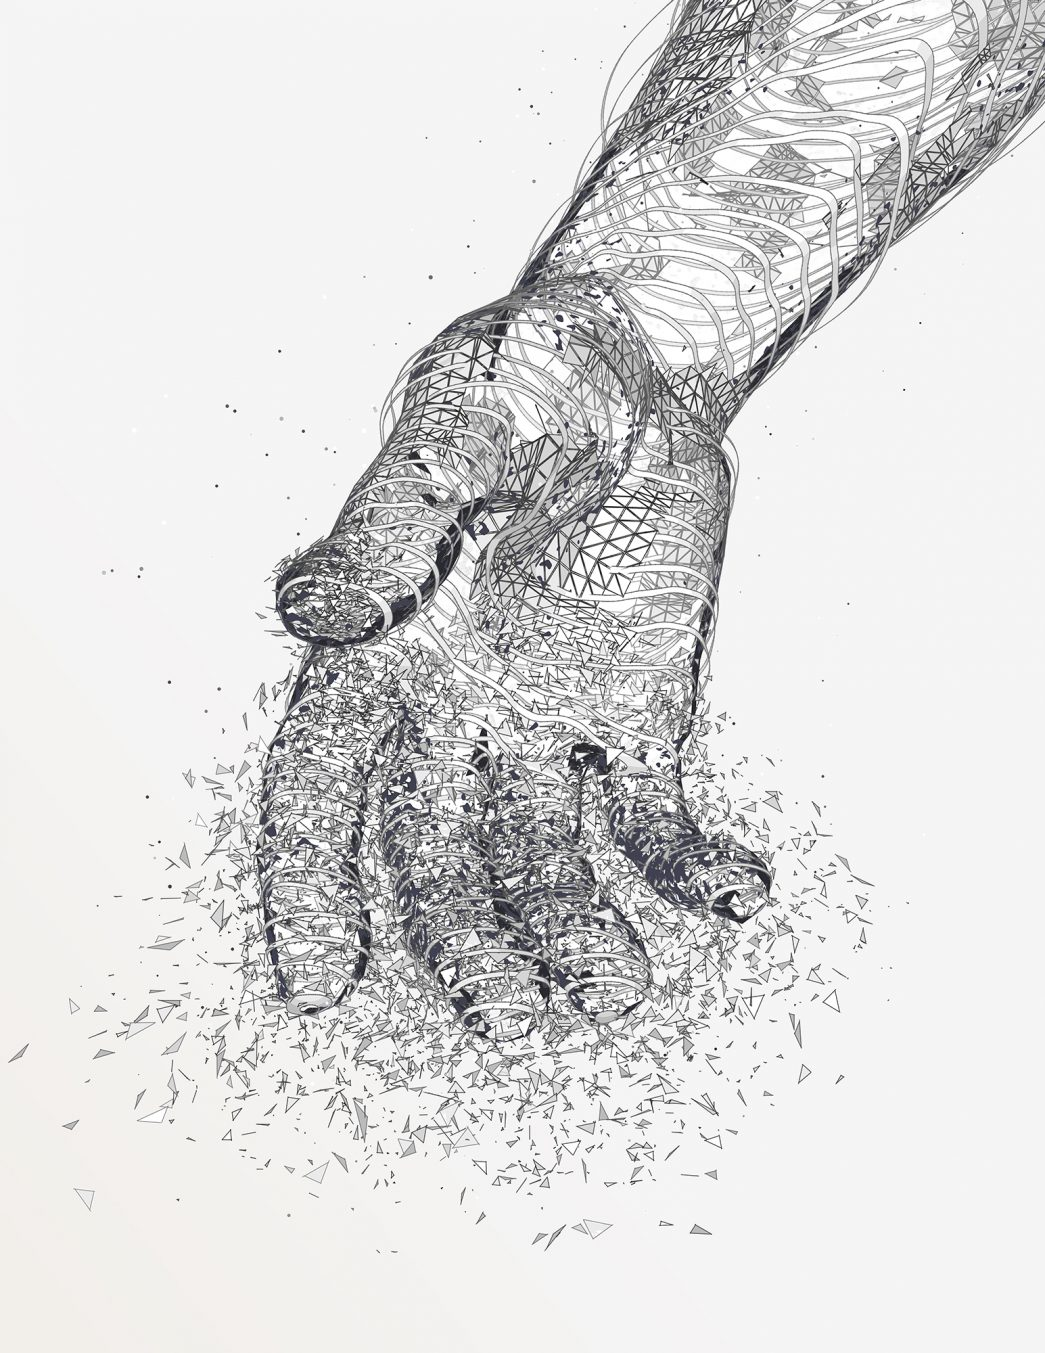 Hriso_Peter_Hand